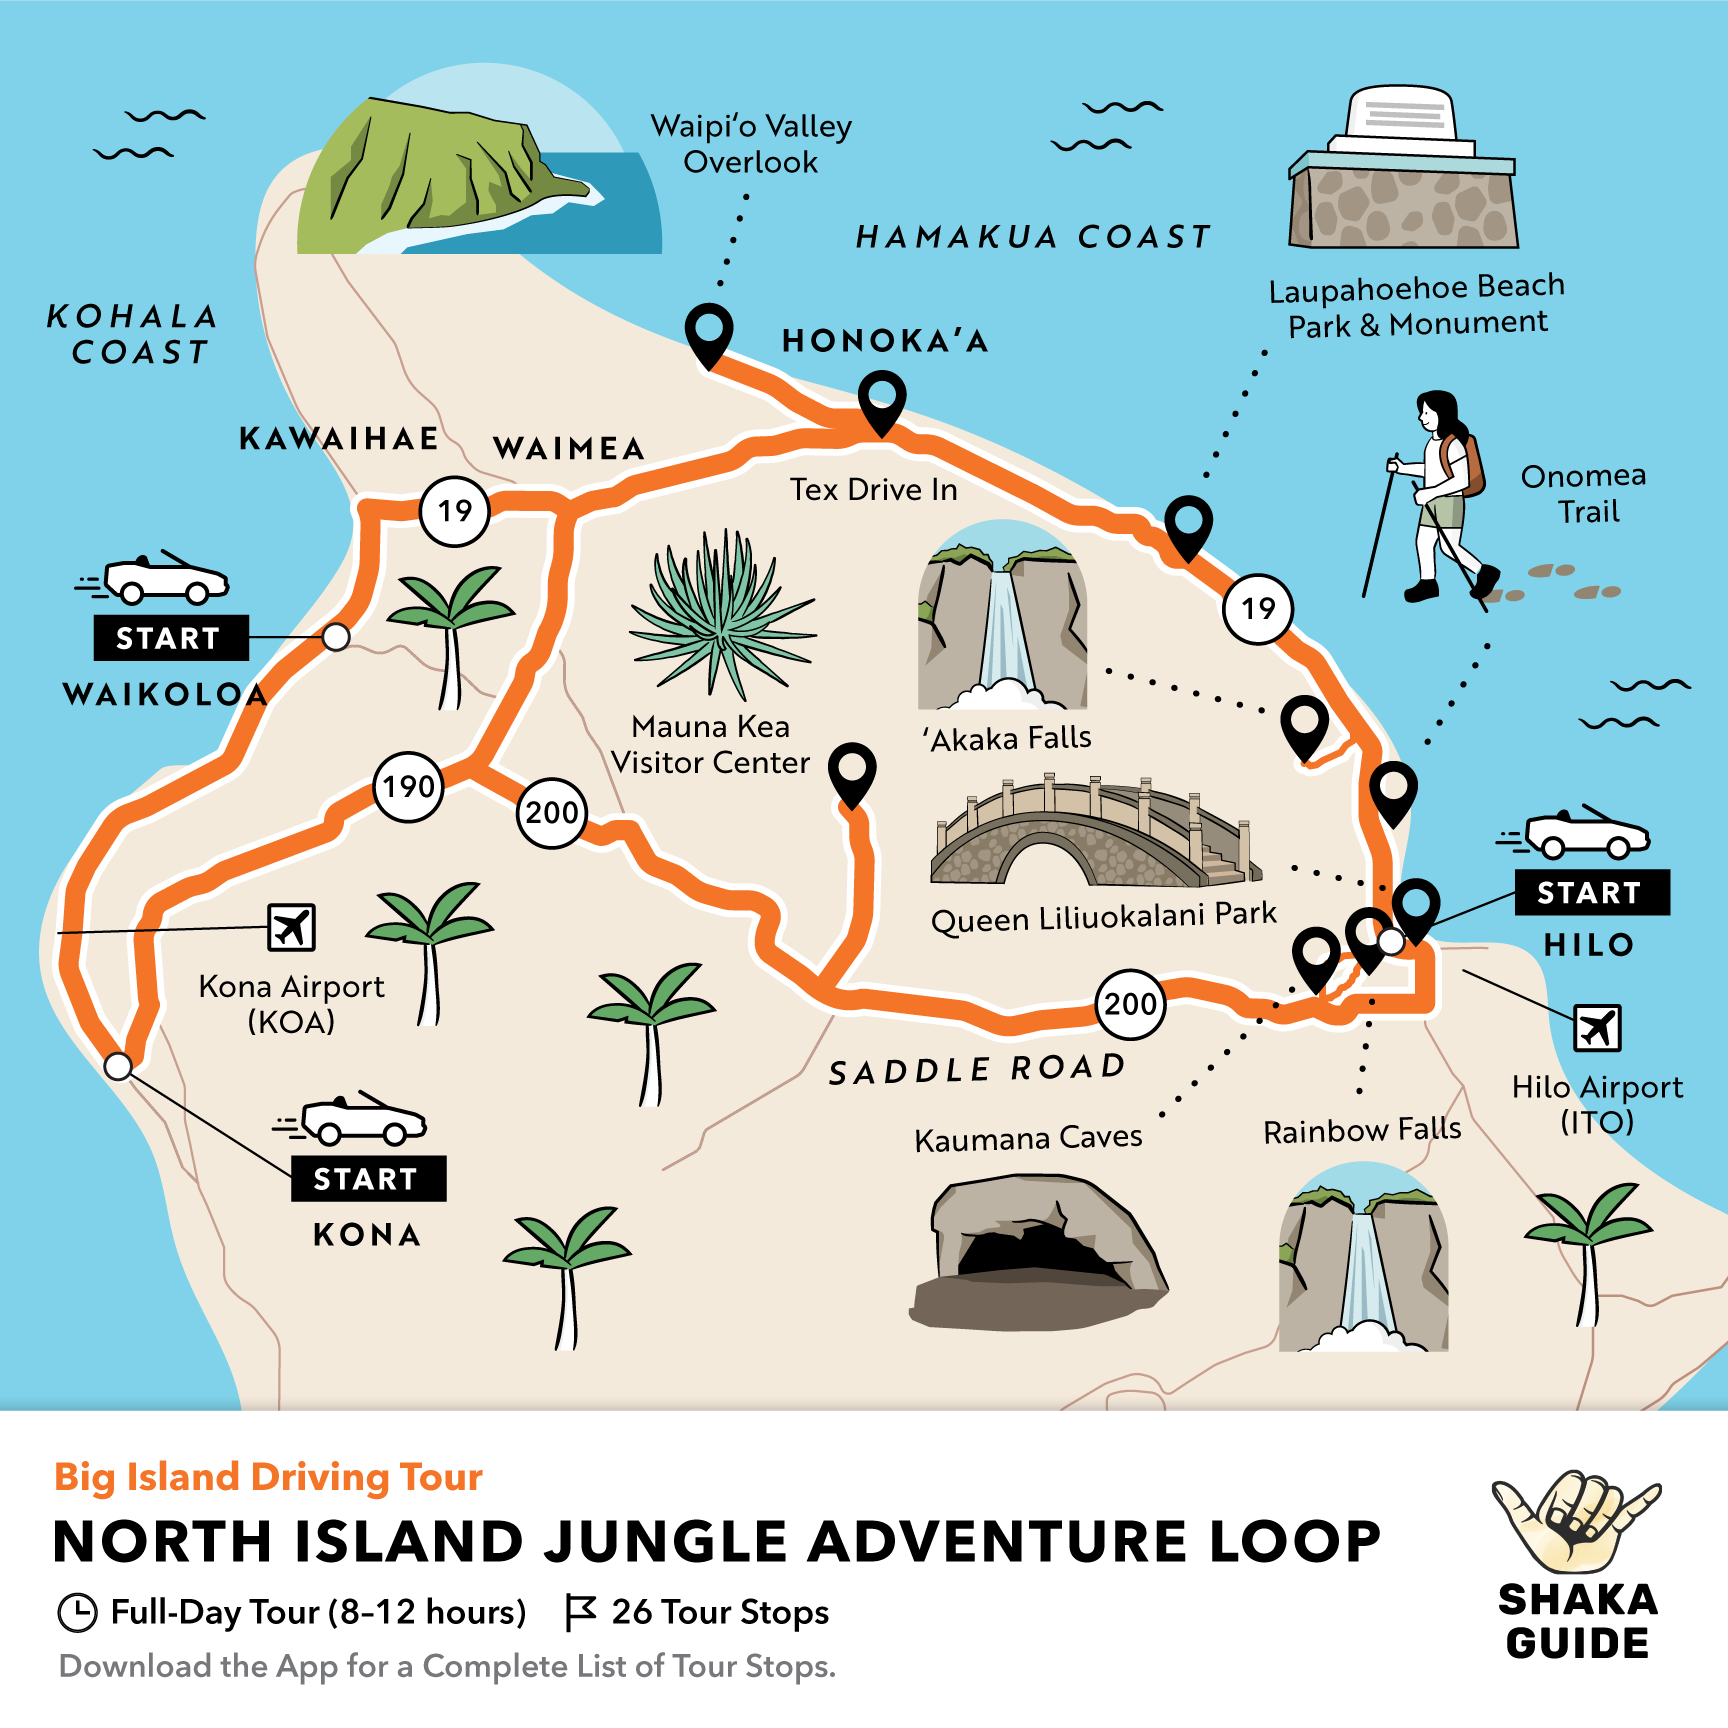 Shaka Guide's North Island Jungle Adventure Loop